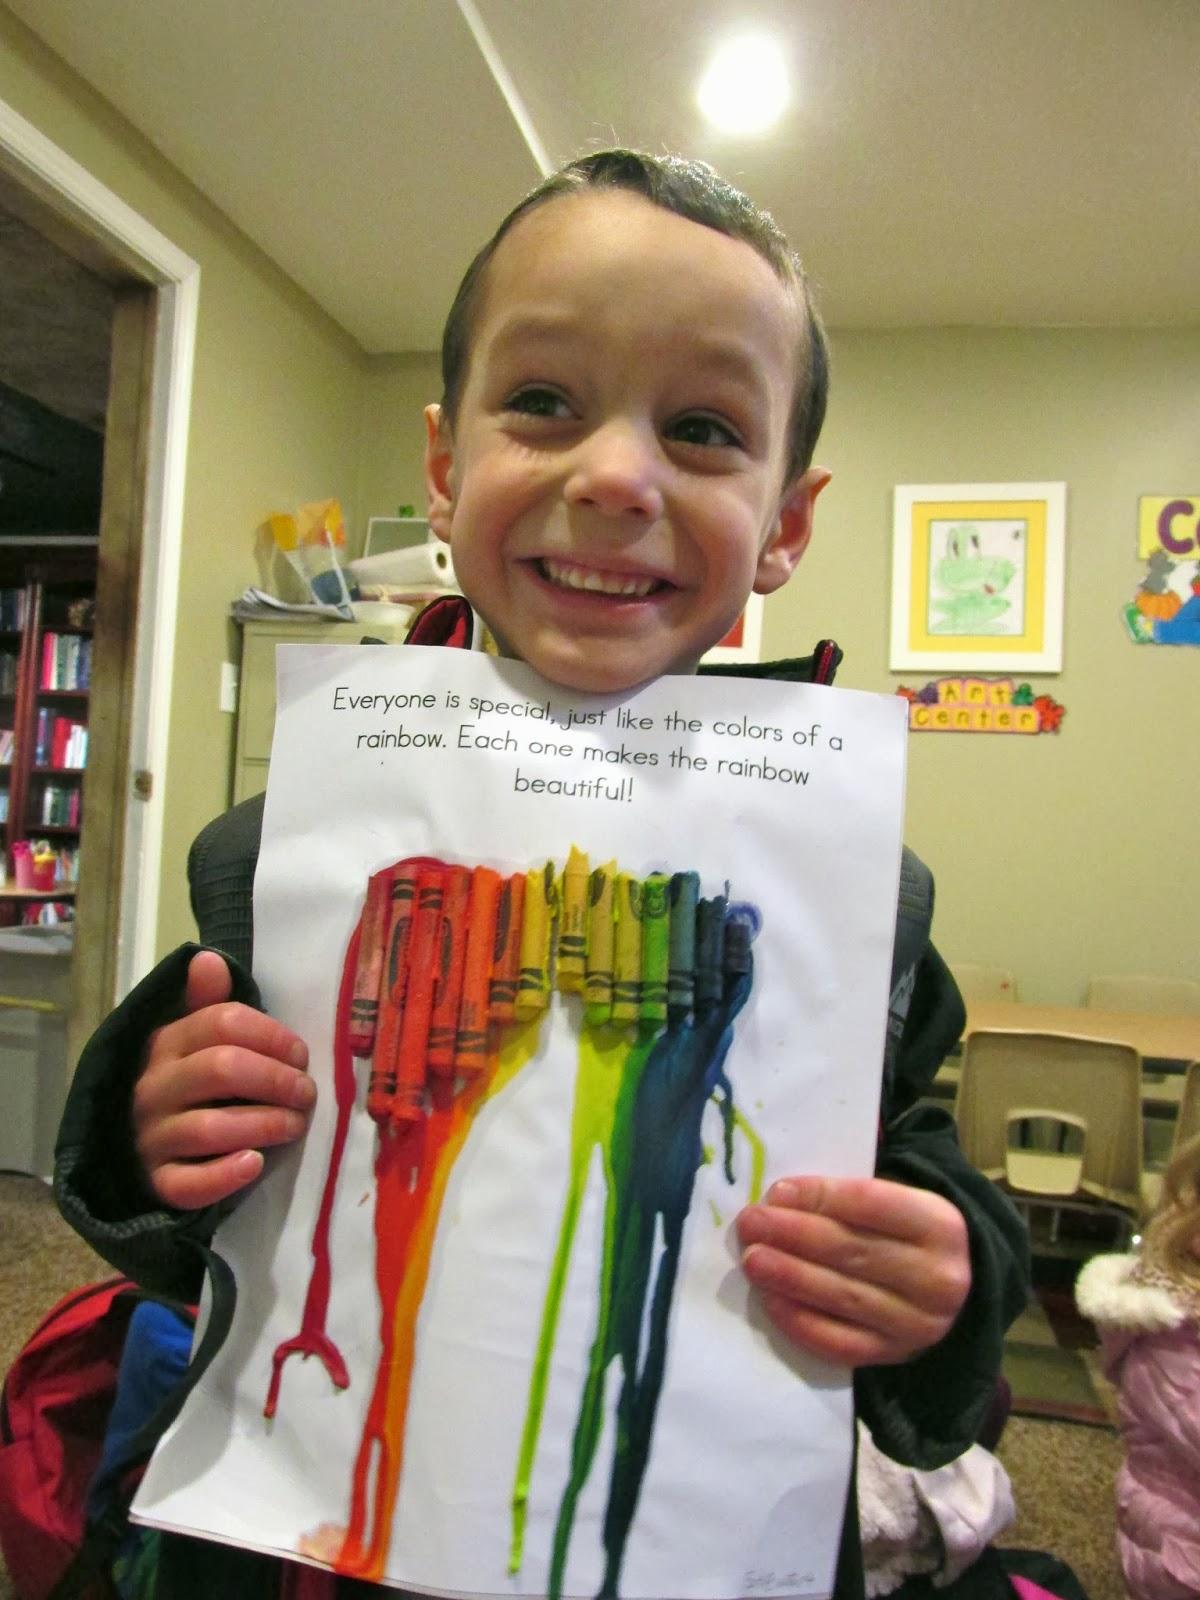 MLK preschool crayon art activity